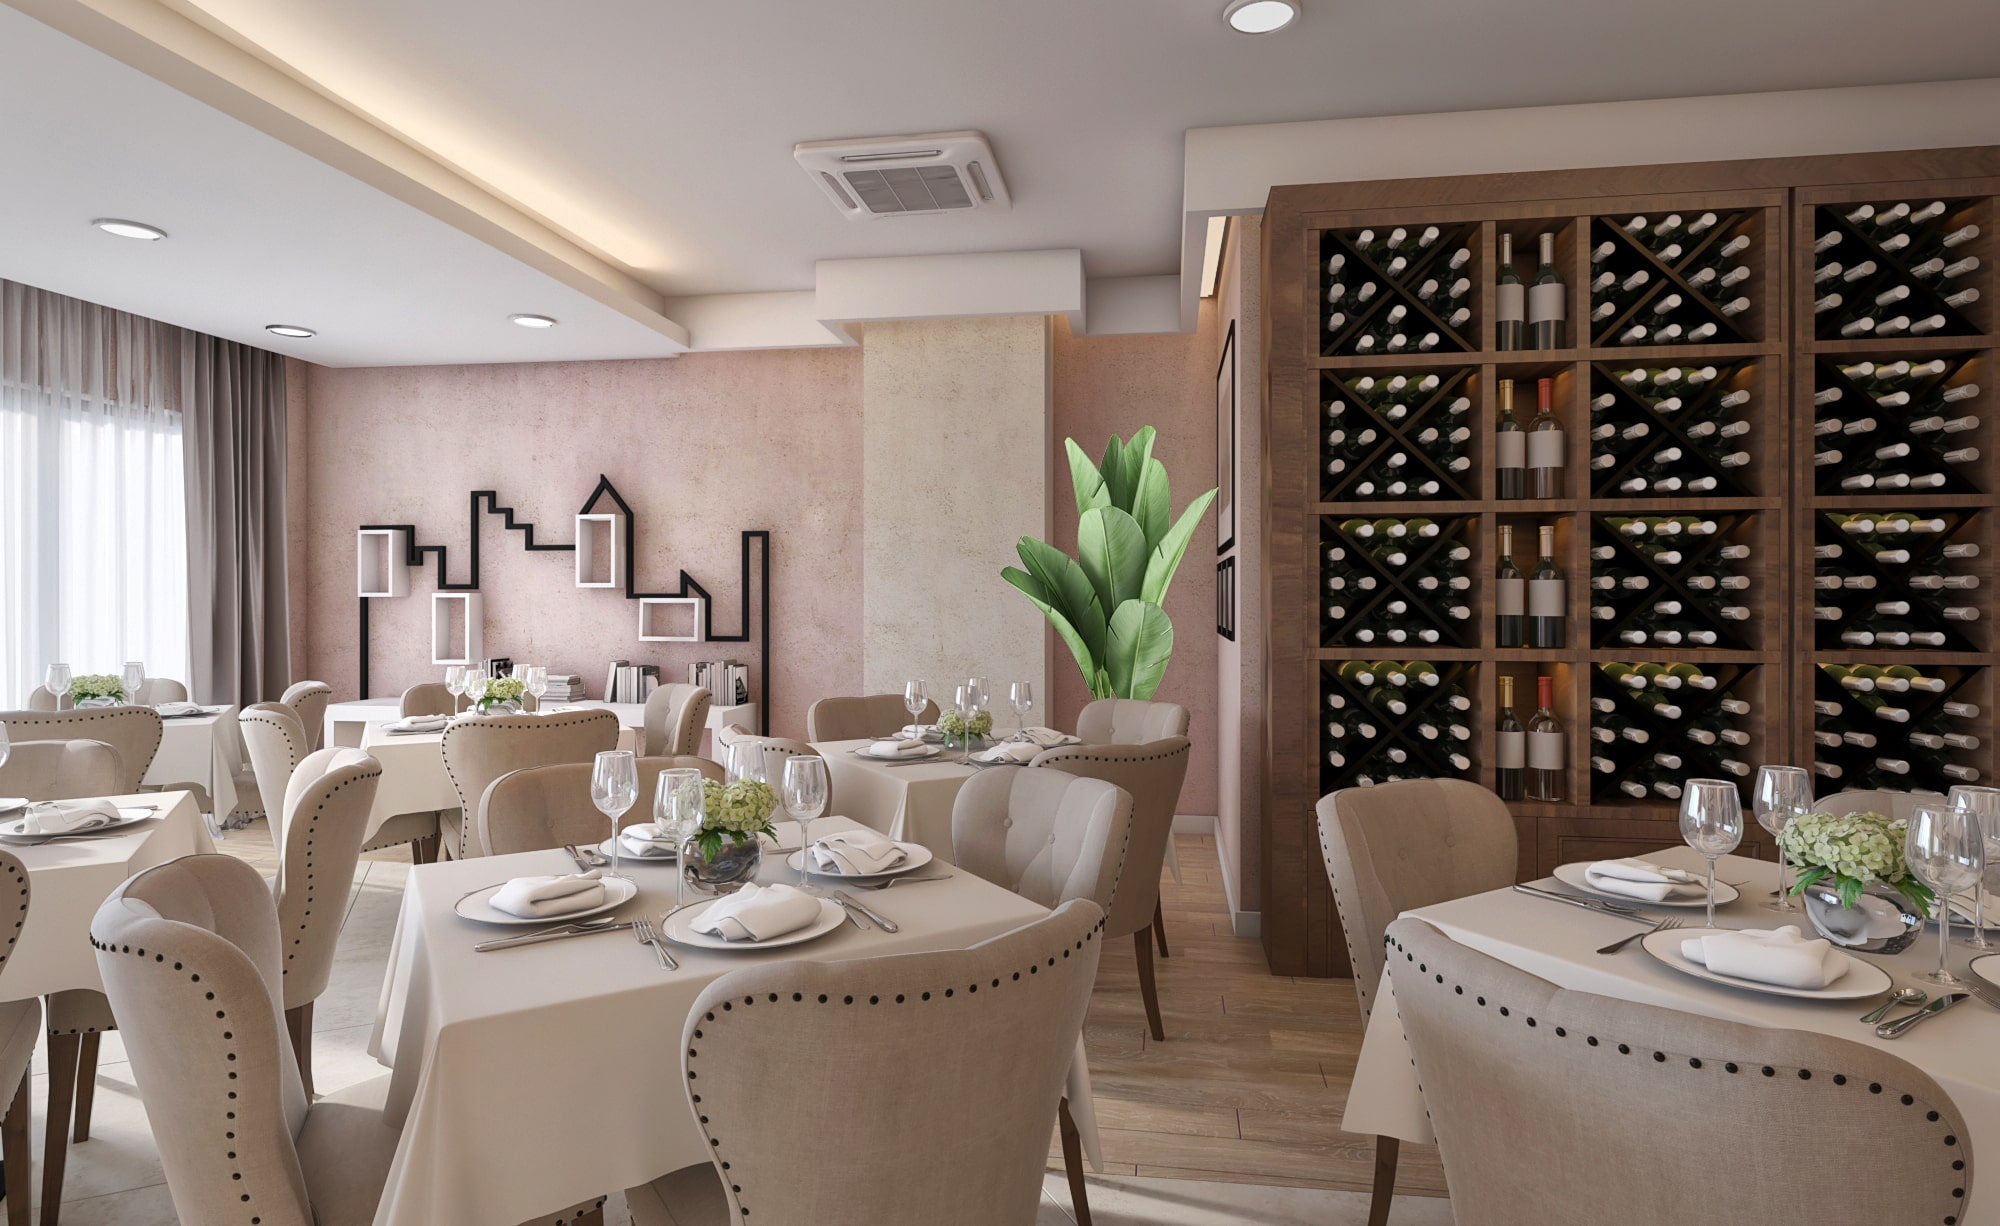 Restaurant in Montenegro ANATOLIA Lounge Cafe Becici - Budva 3.jpg